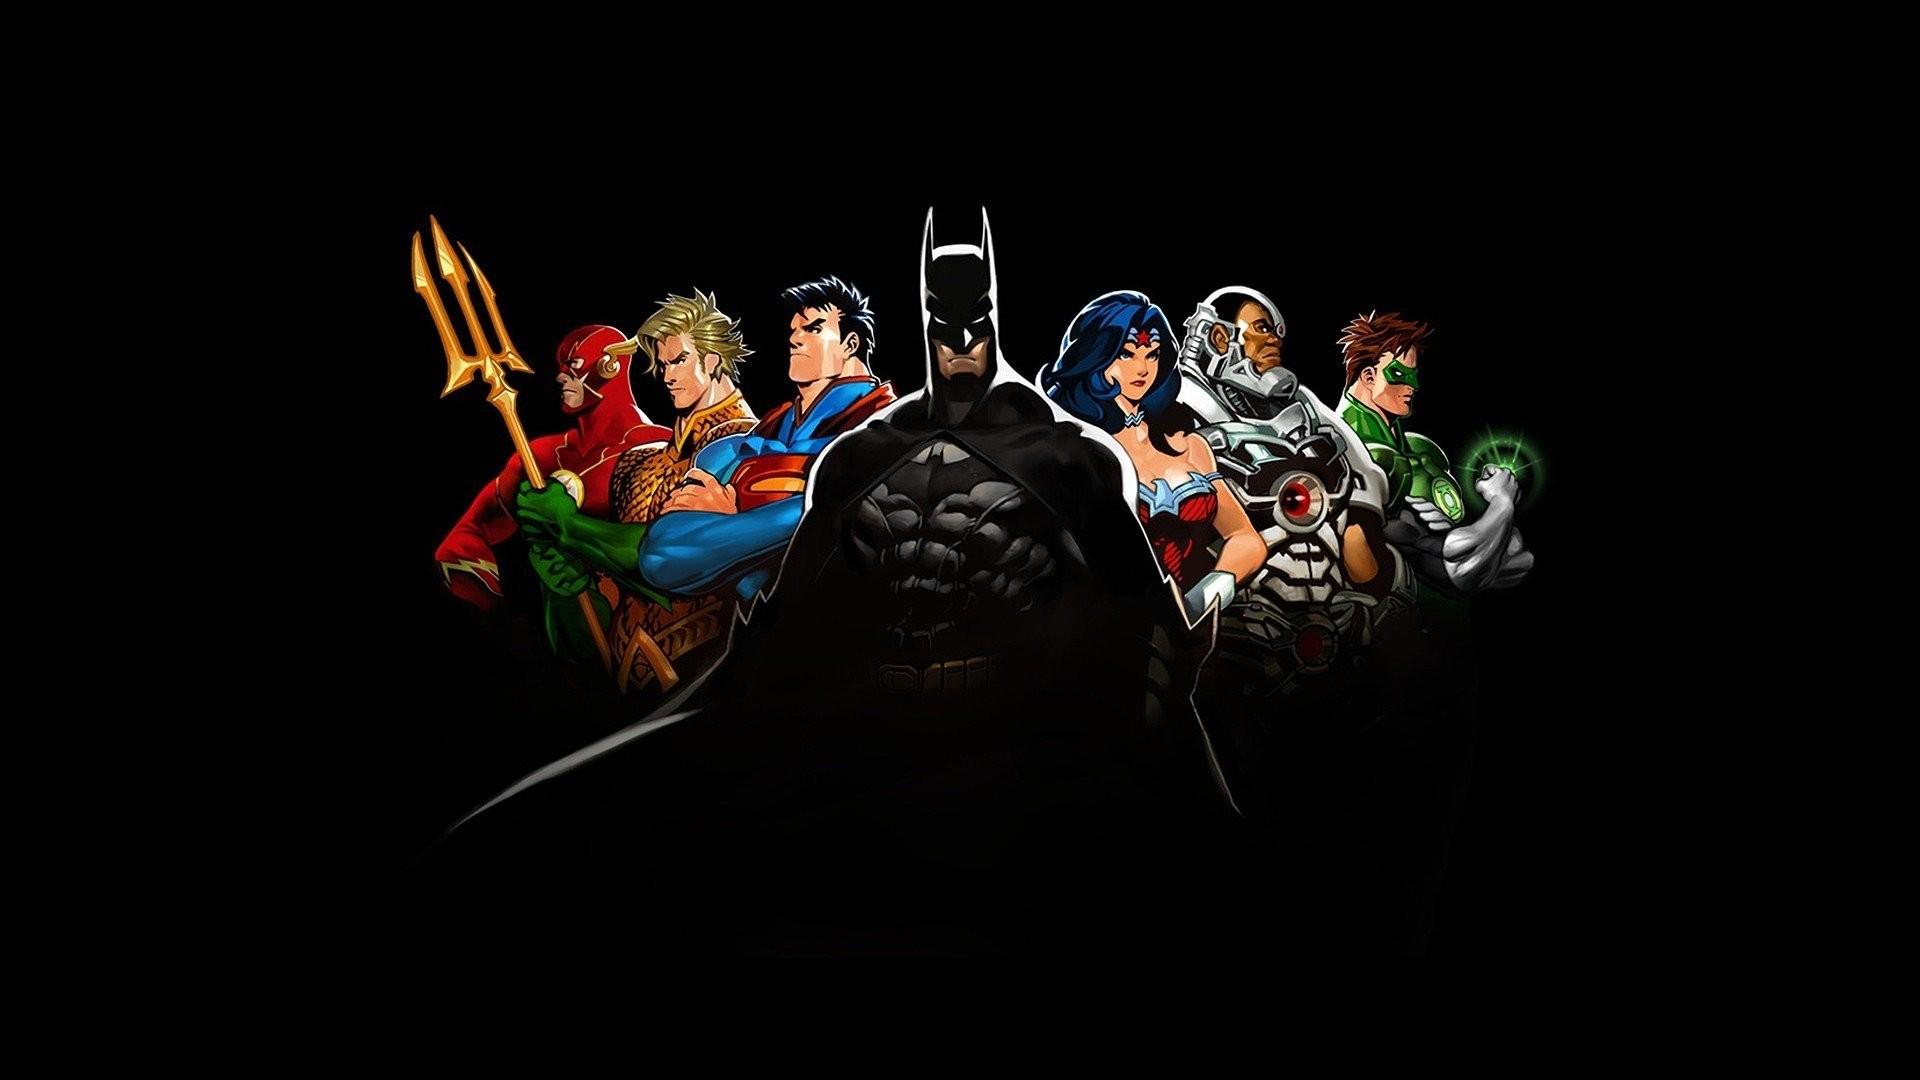 Comics DC Justice League The Flash Batman Superman Wonder Woman Cyborg  Green Lantern Aquaman